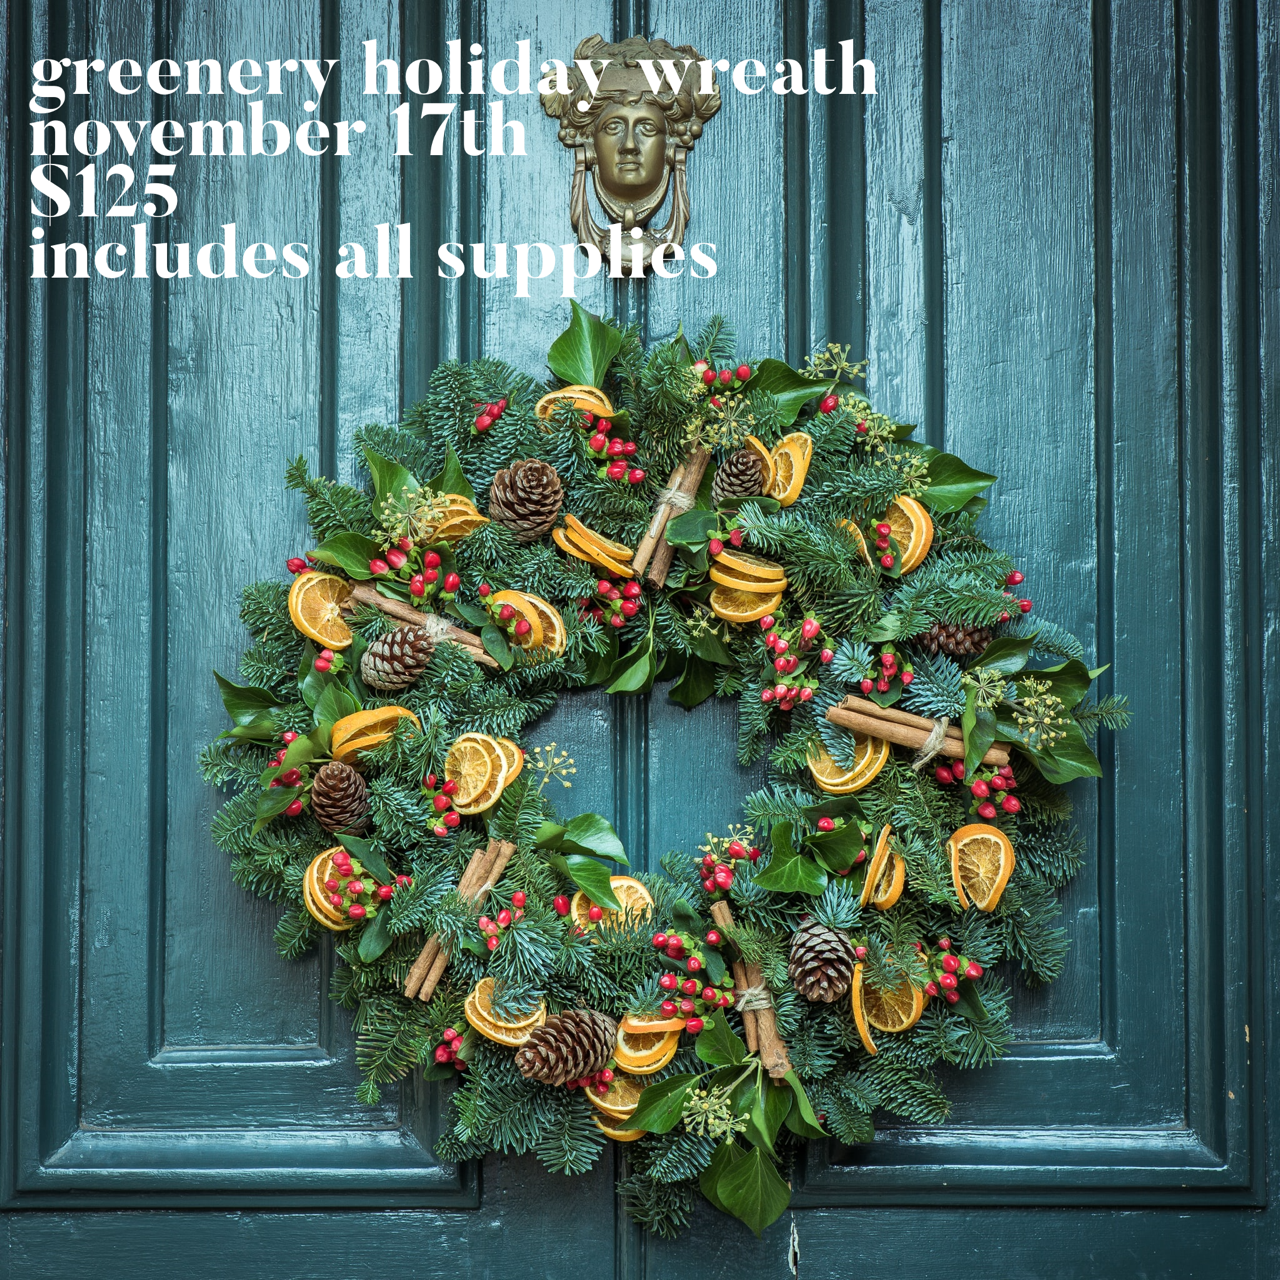 Greenery Holiday Wreath Nov 17